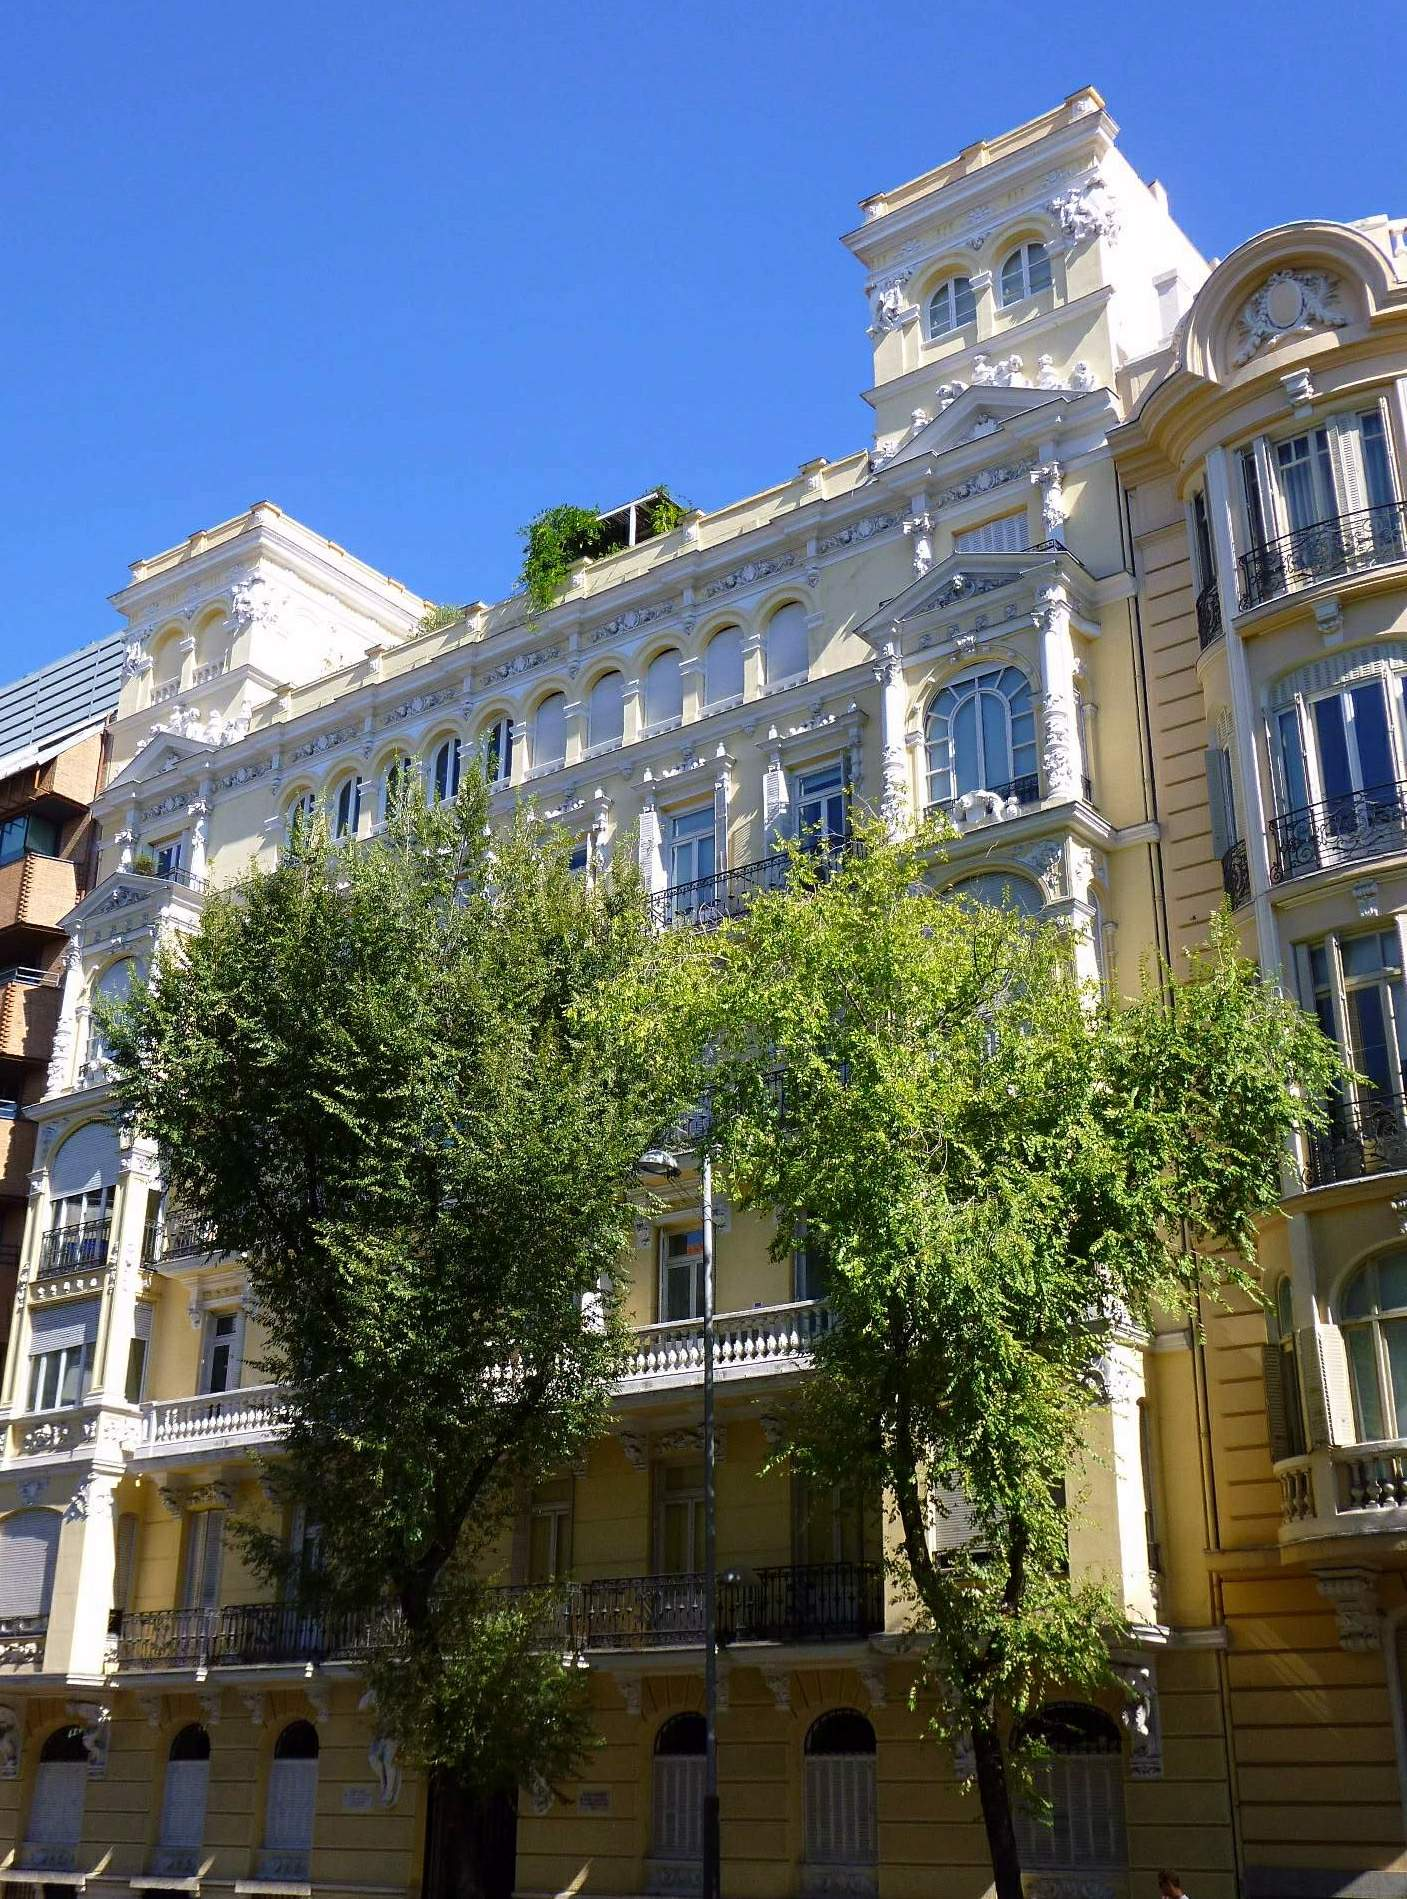 Archivo madrid calle almagro edificio juli n mart nez - H m calle orense madrid ...